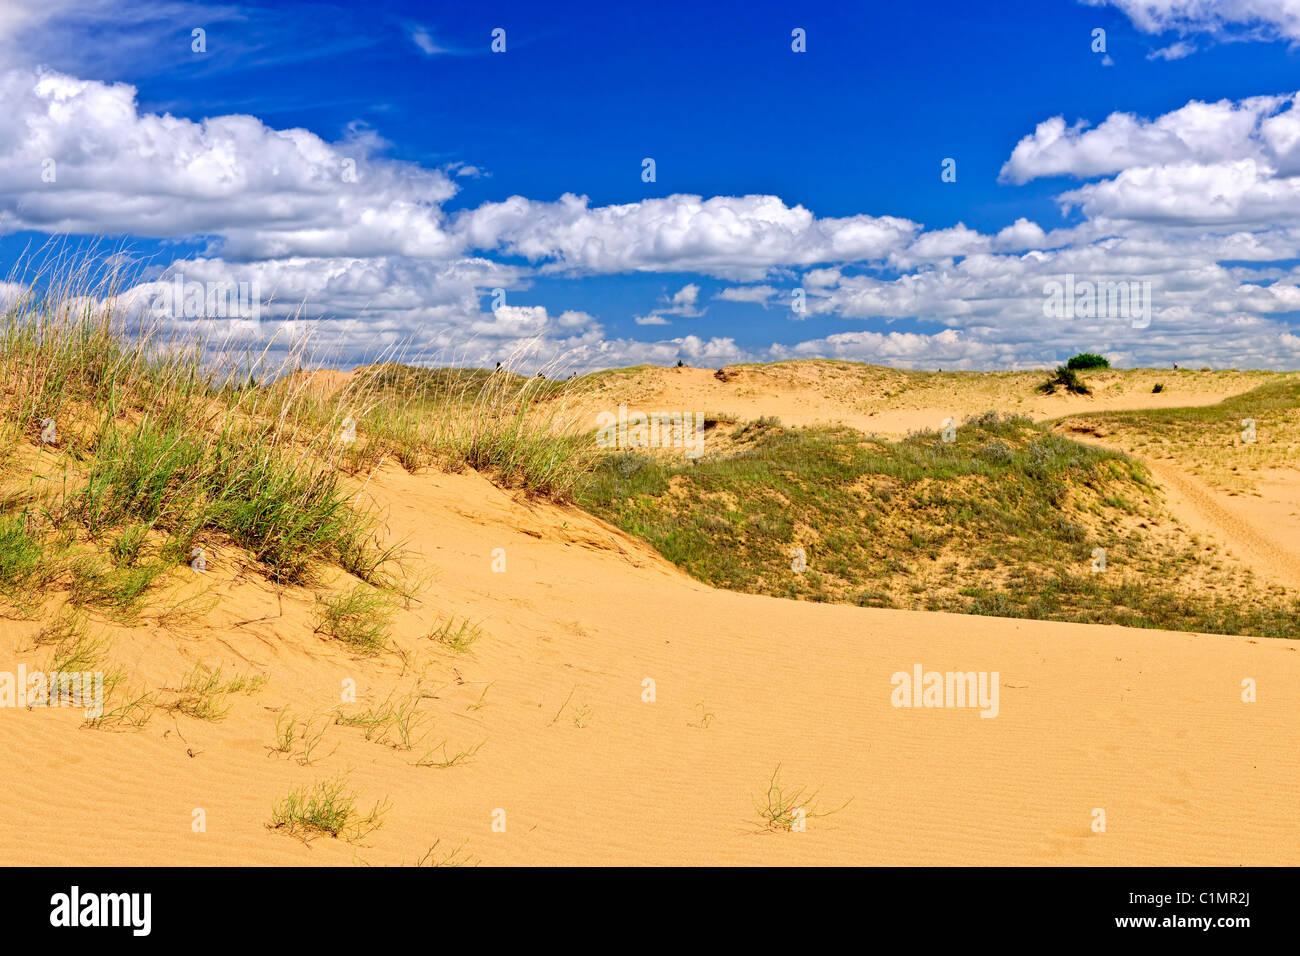 Landscape of Spirit Sands dunes in Spruce Woods Provincial Park, Manitoba, Canada - Stock Image